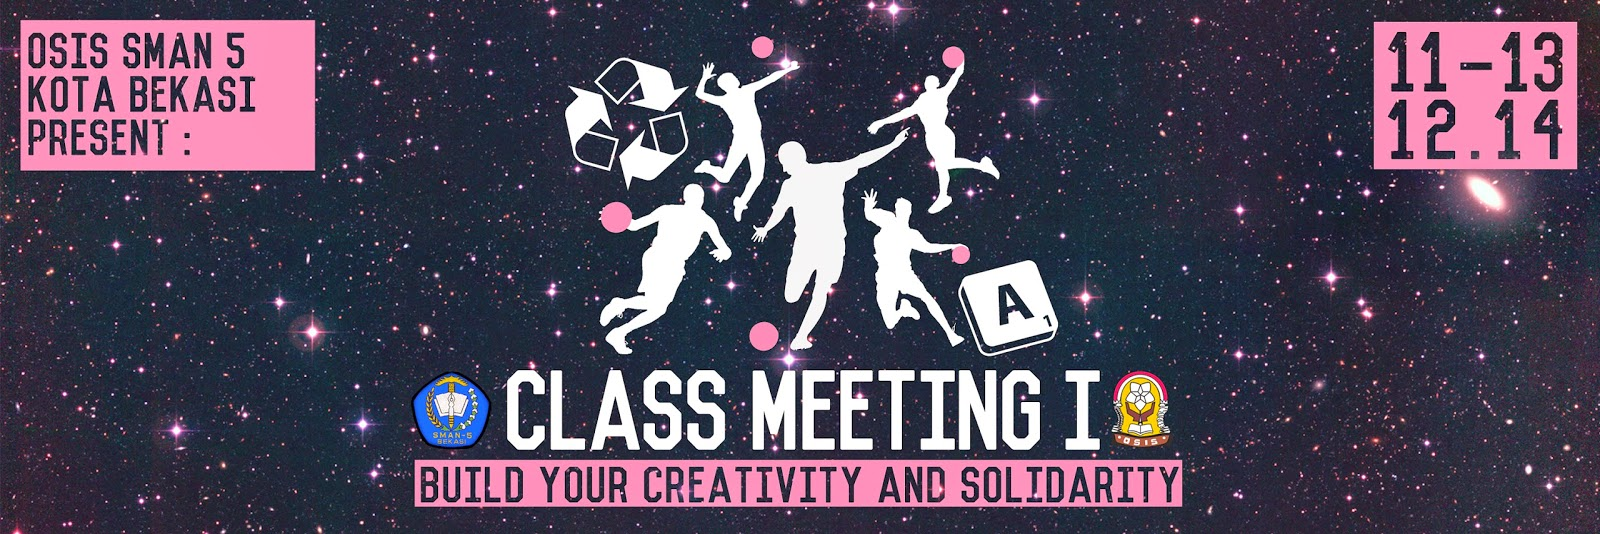 Class Meeting I